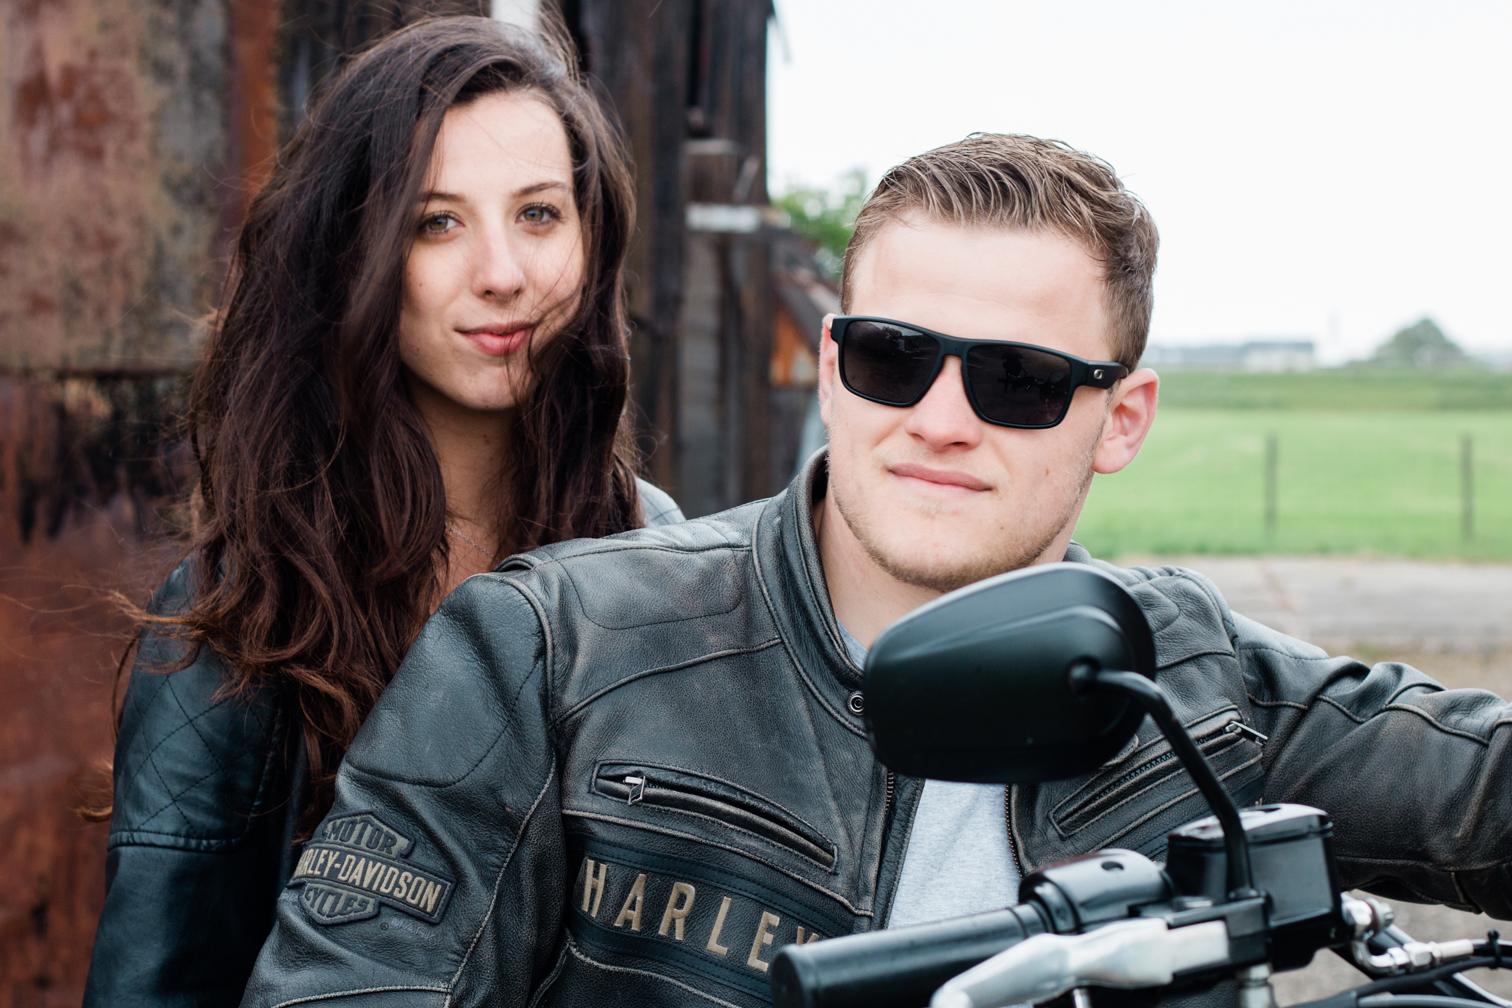 harley davidson motor bike